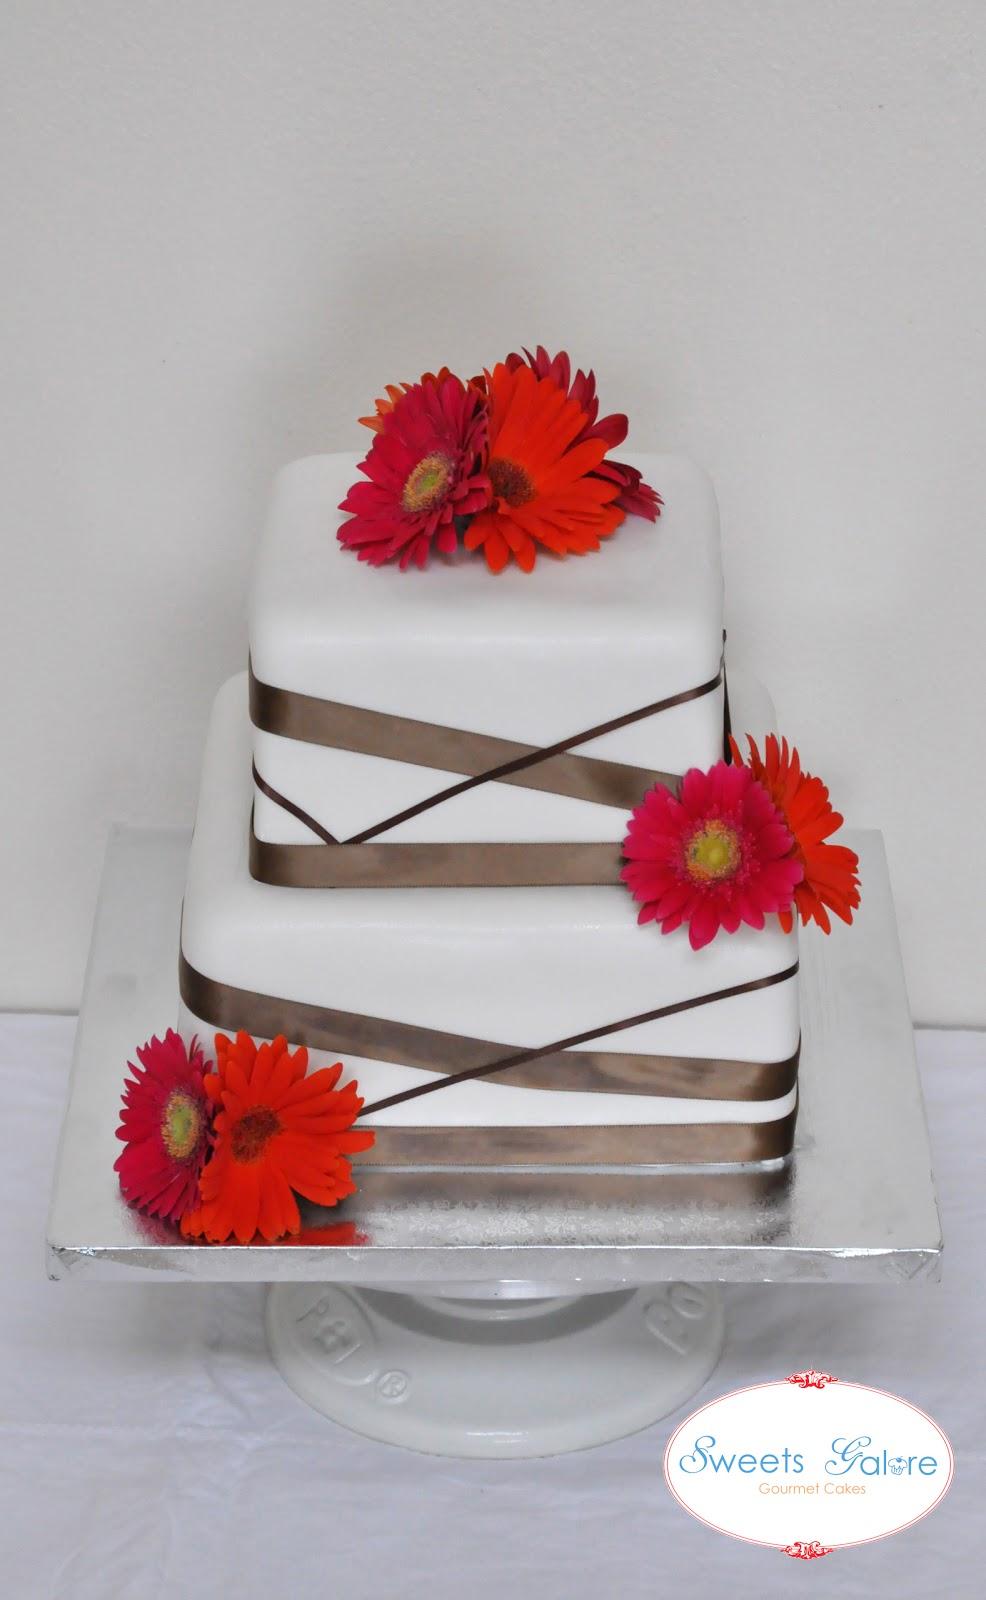 Sweets Galore Modern Daisy Wedding Cake